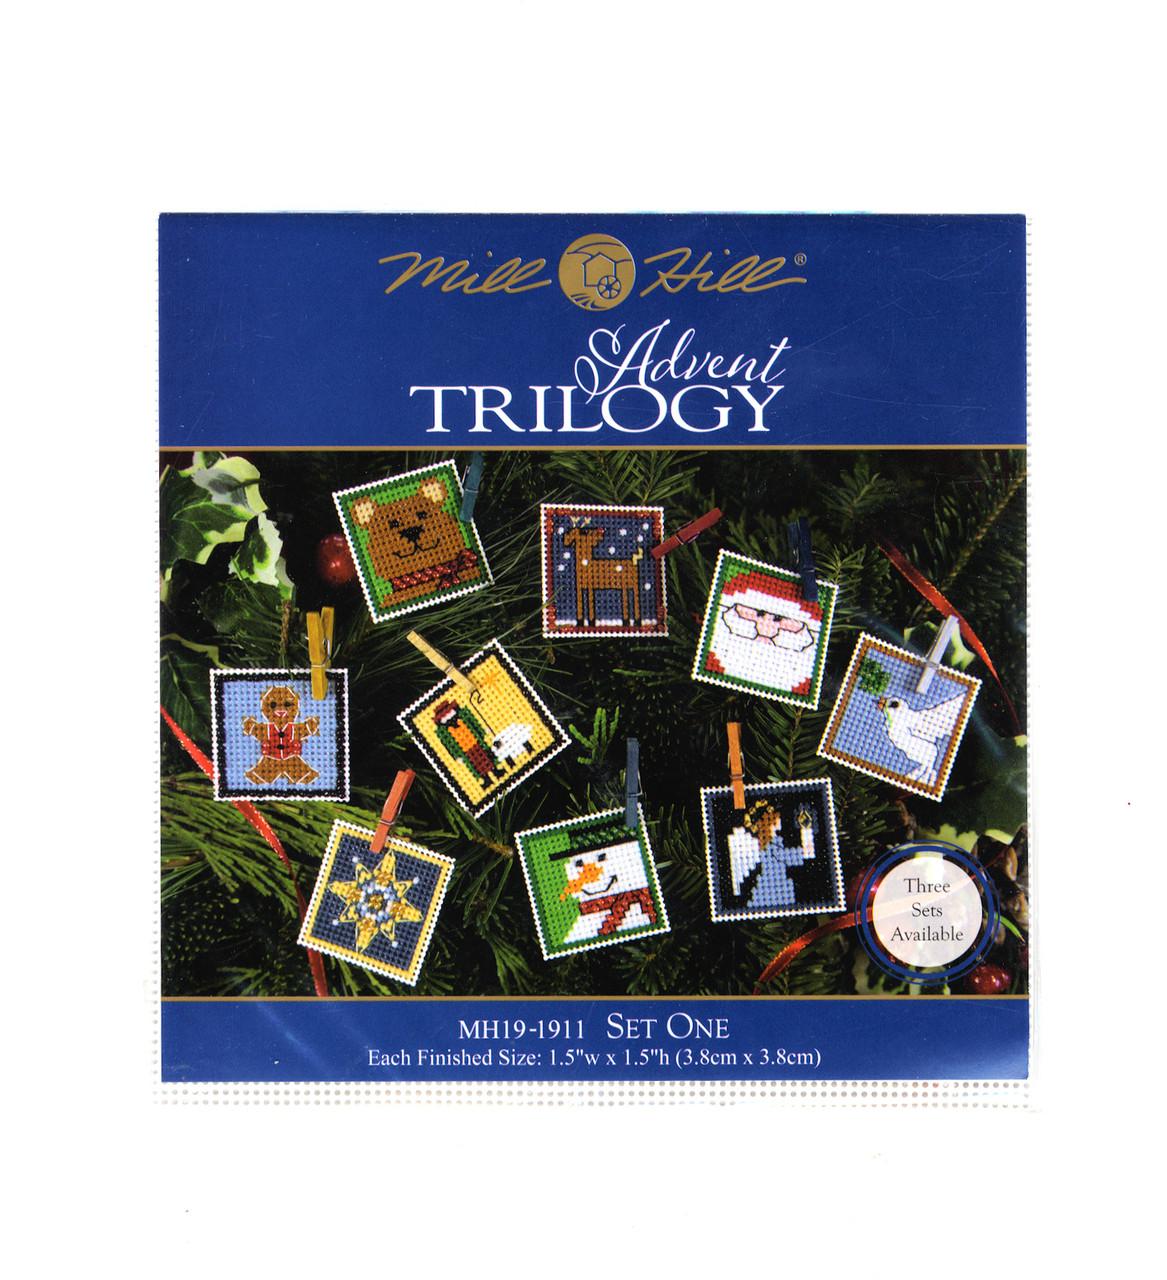 2019 Mill Hill Advent Trilogy (Set of 3 Kits)